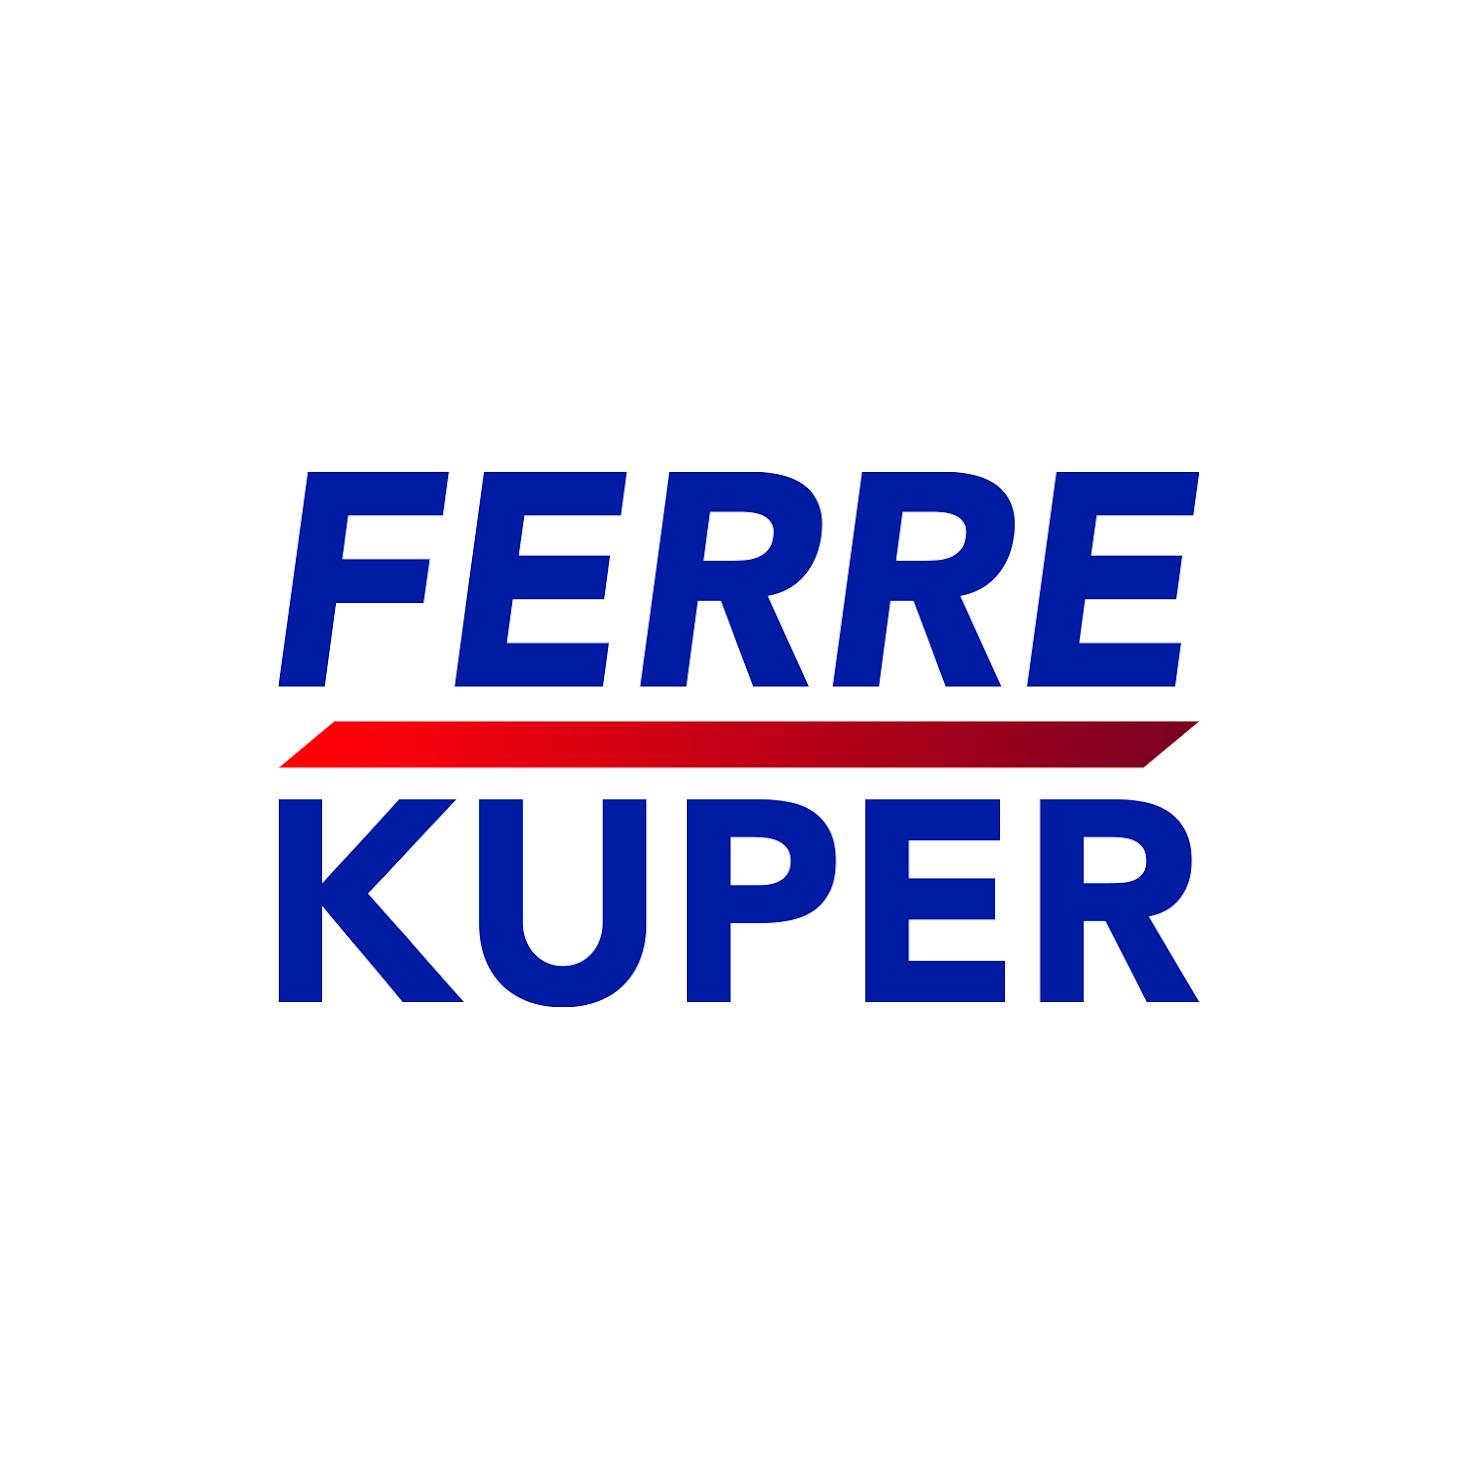 https://ferrekuper.mercadoshops.com.mx/bellota